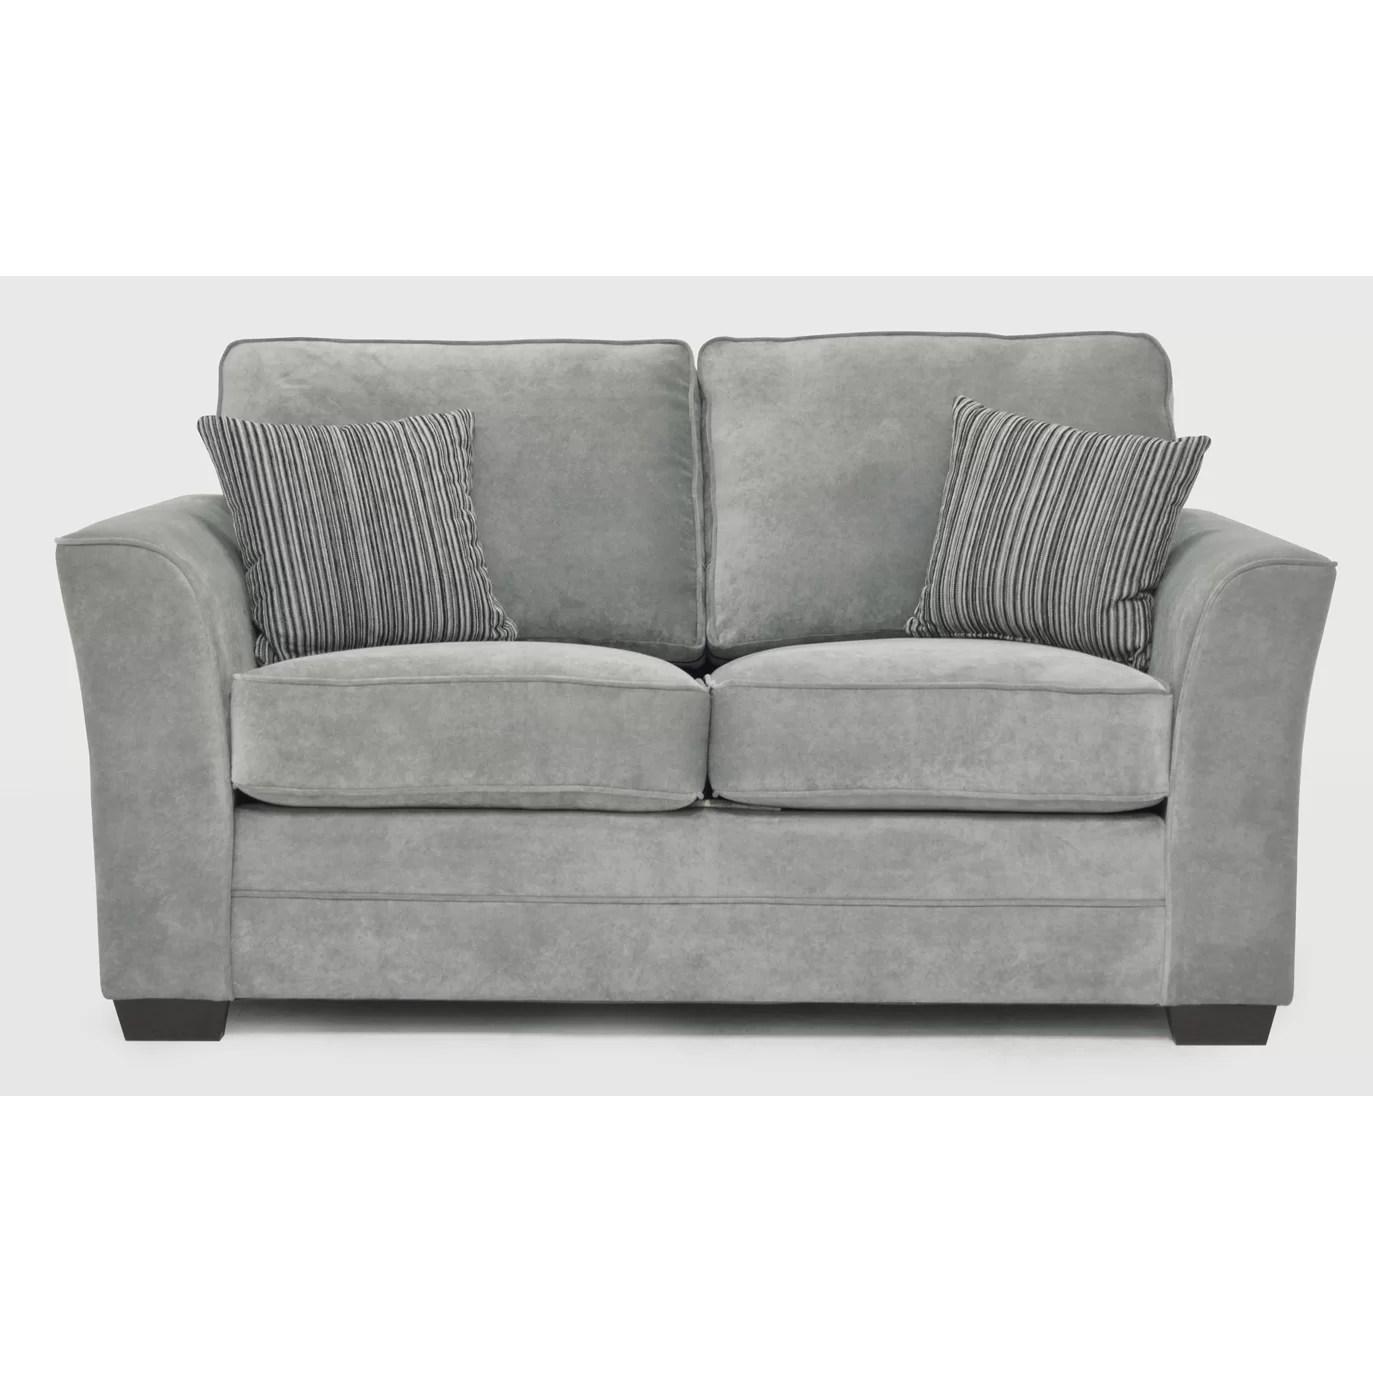 the sofa factory reviews big leather corner sofas artena 2 seater wayfair uk